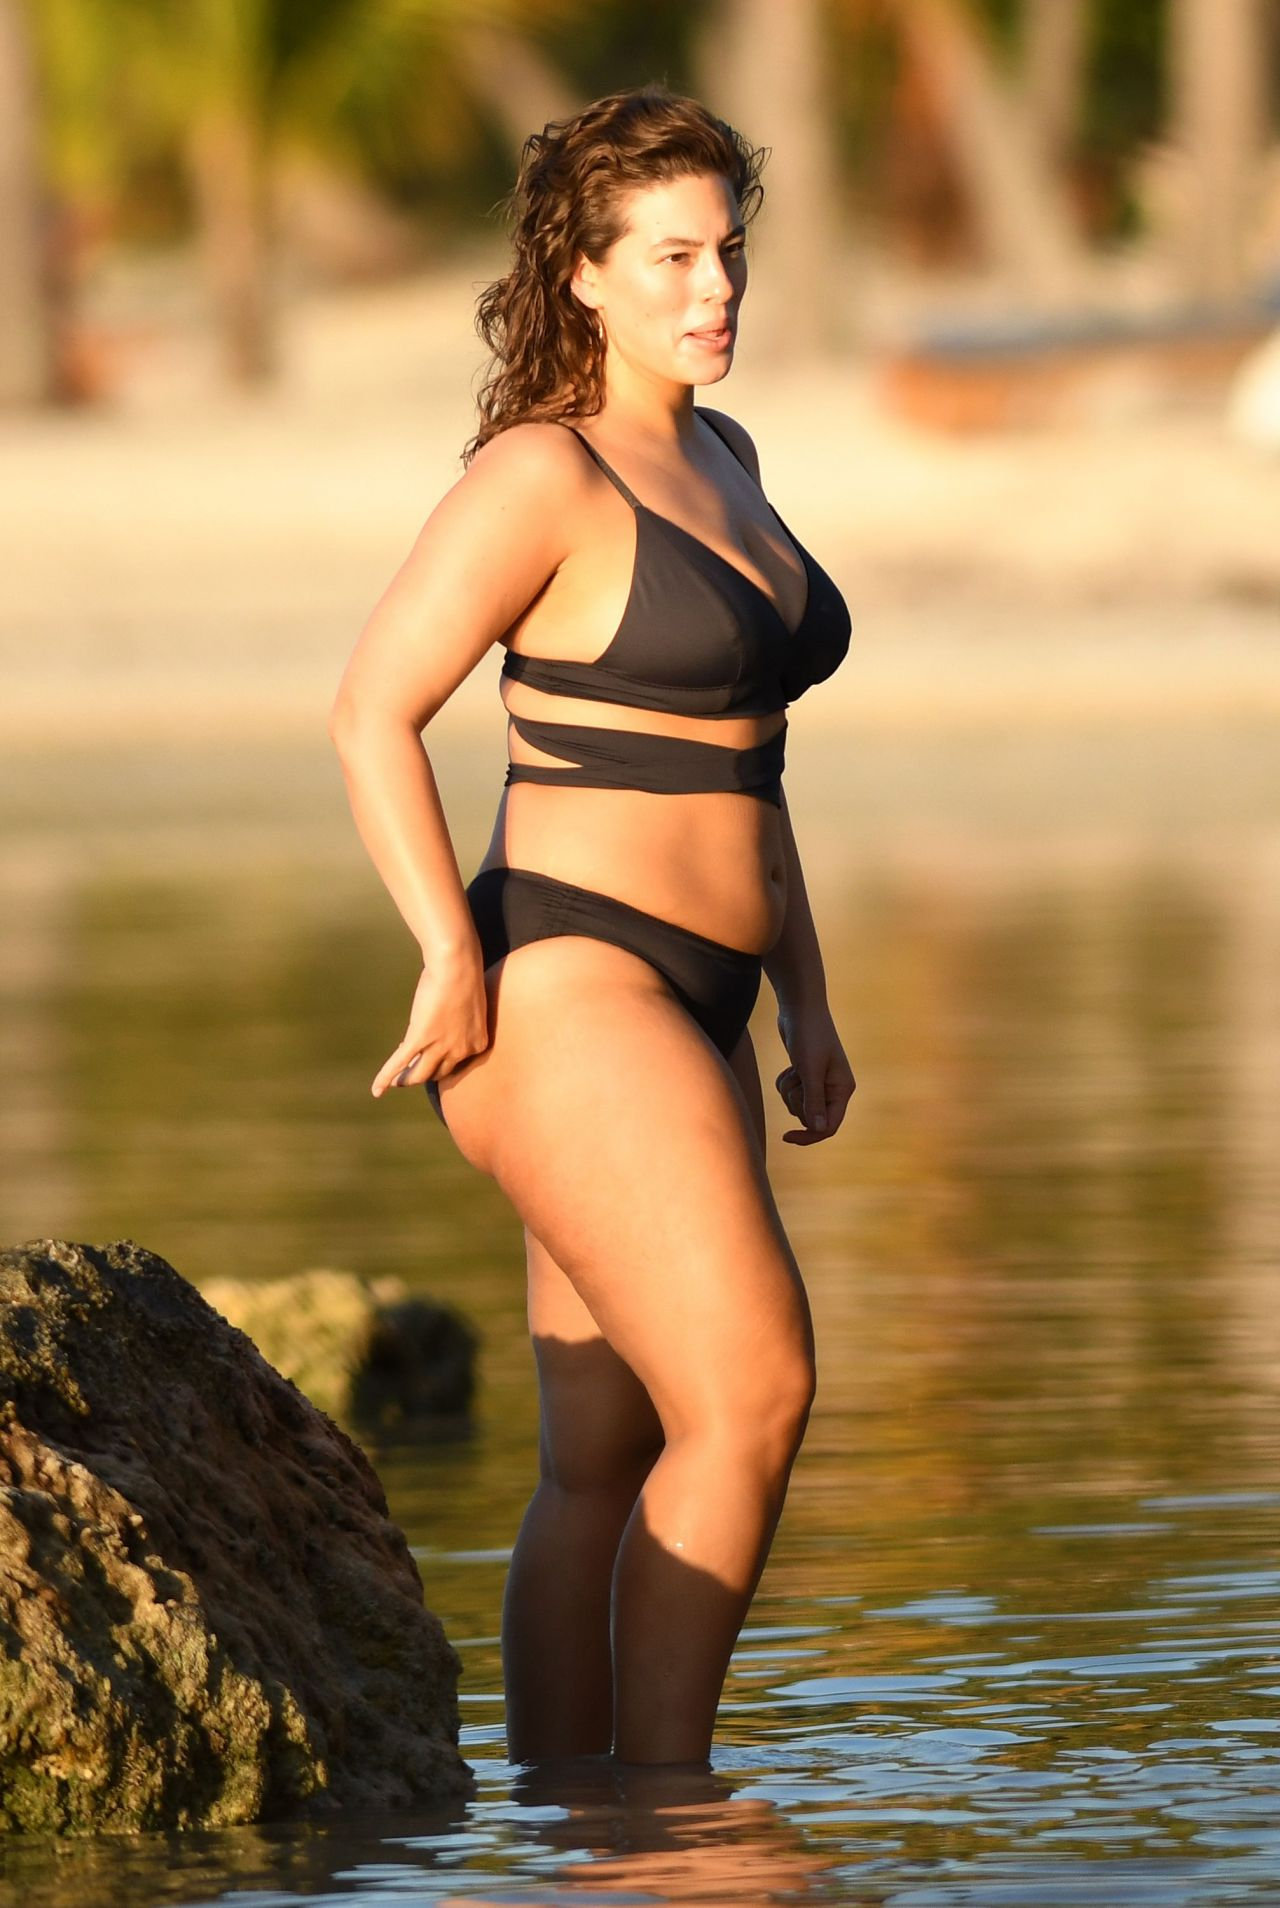 Ashley Graham In A Black Bikini On The Beach In Islamorada